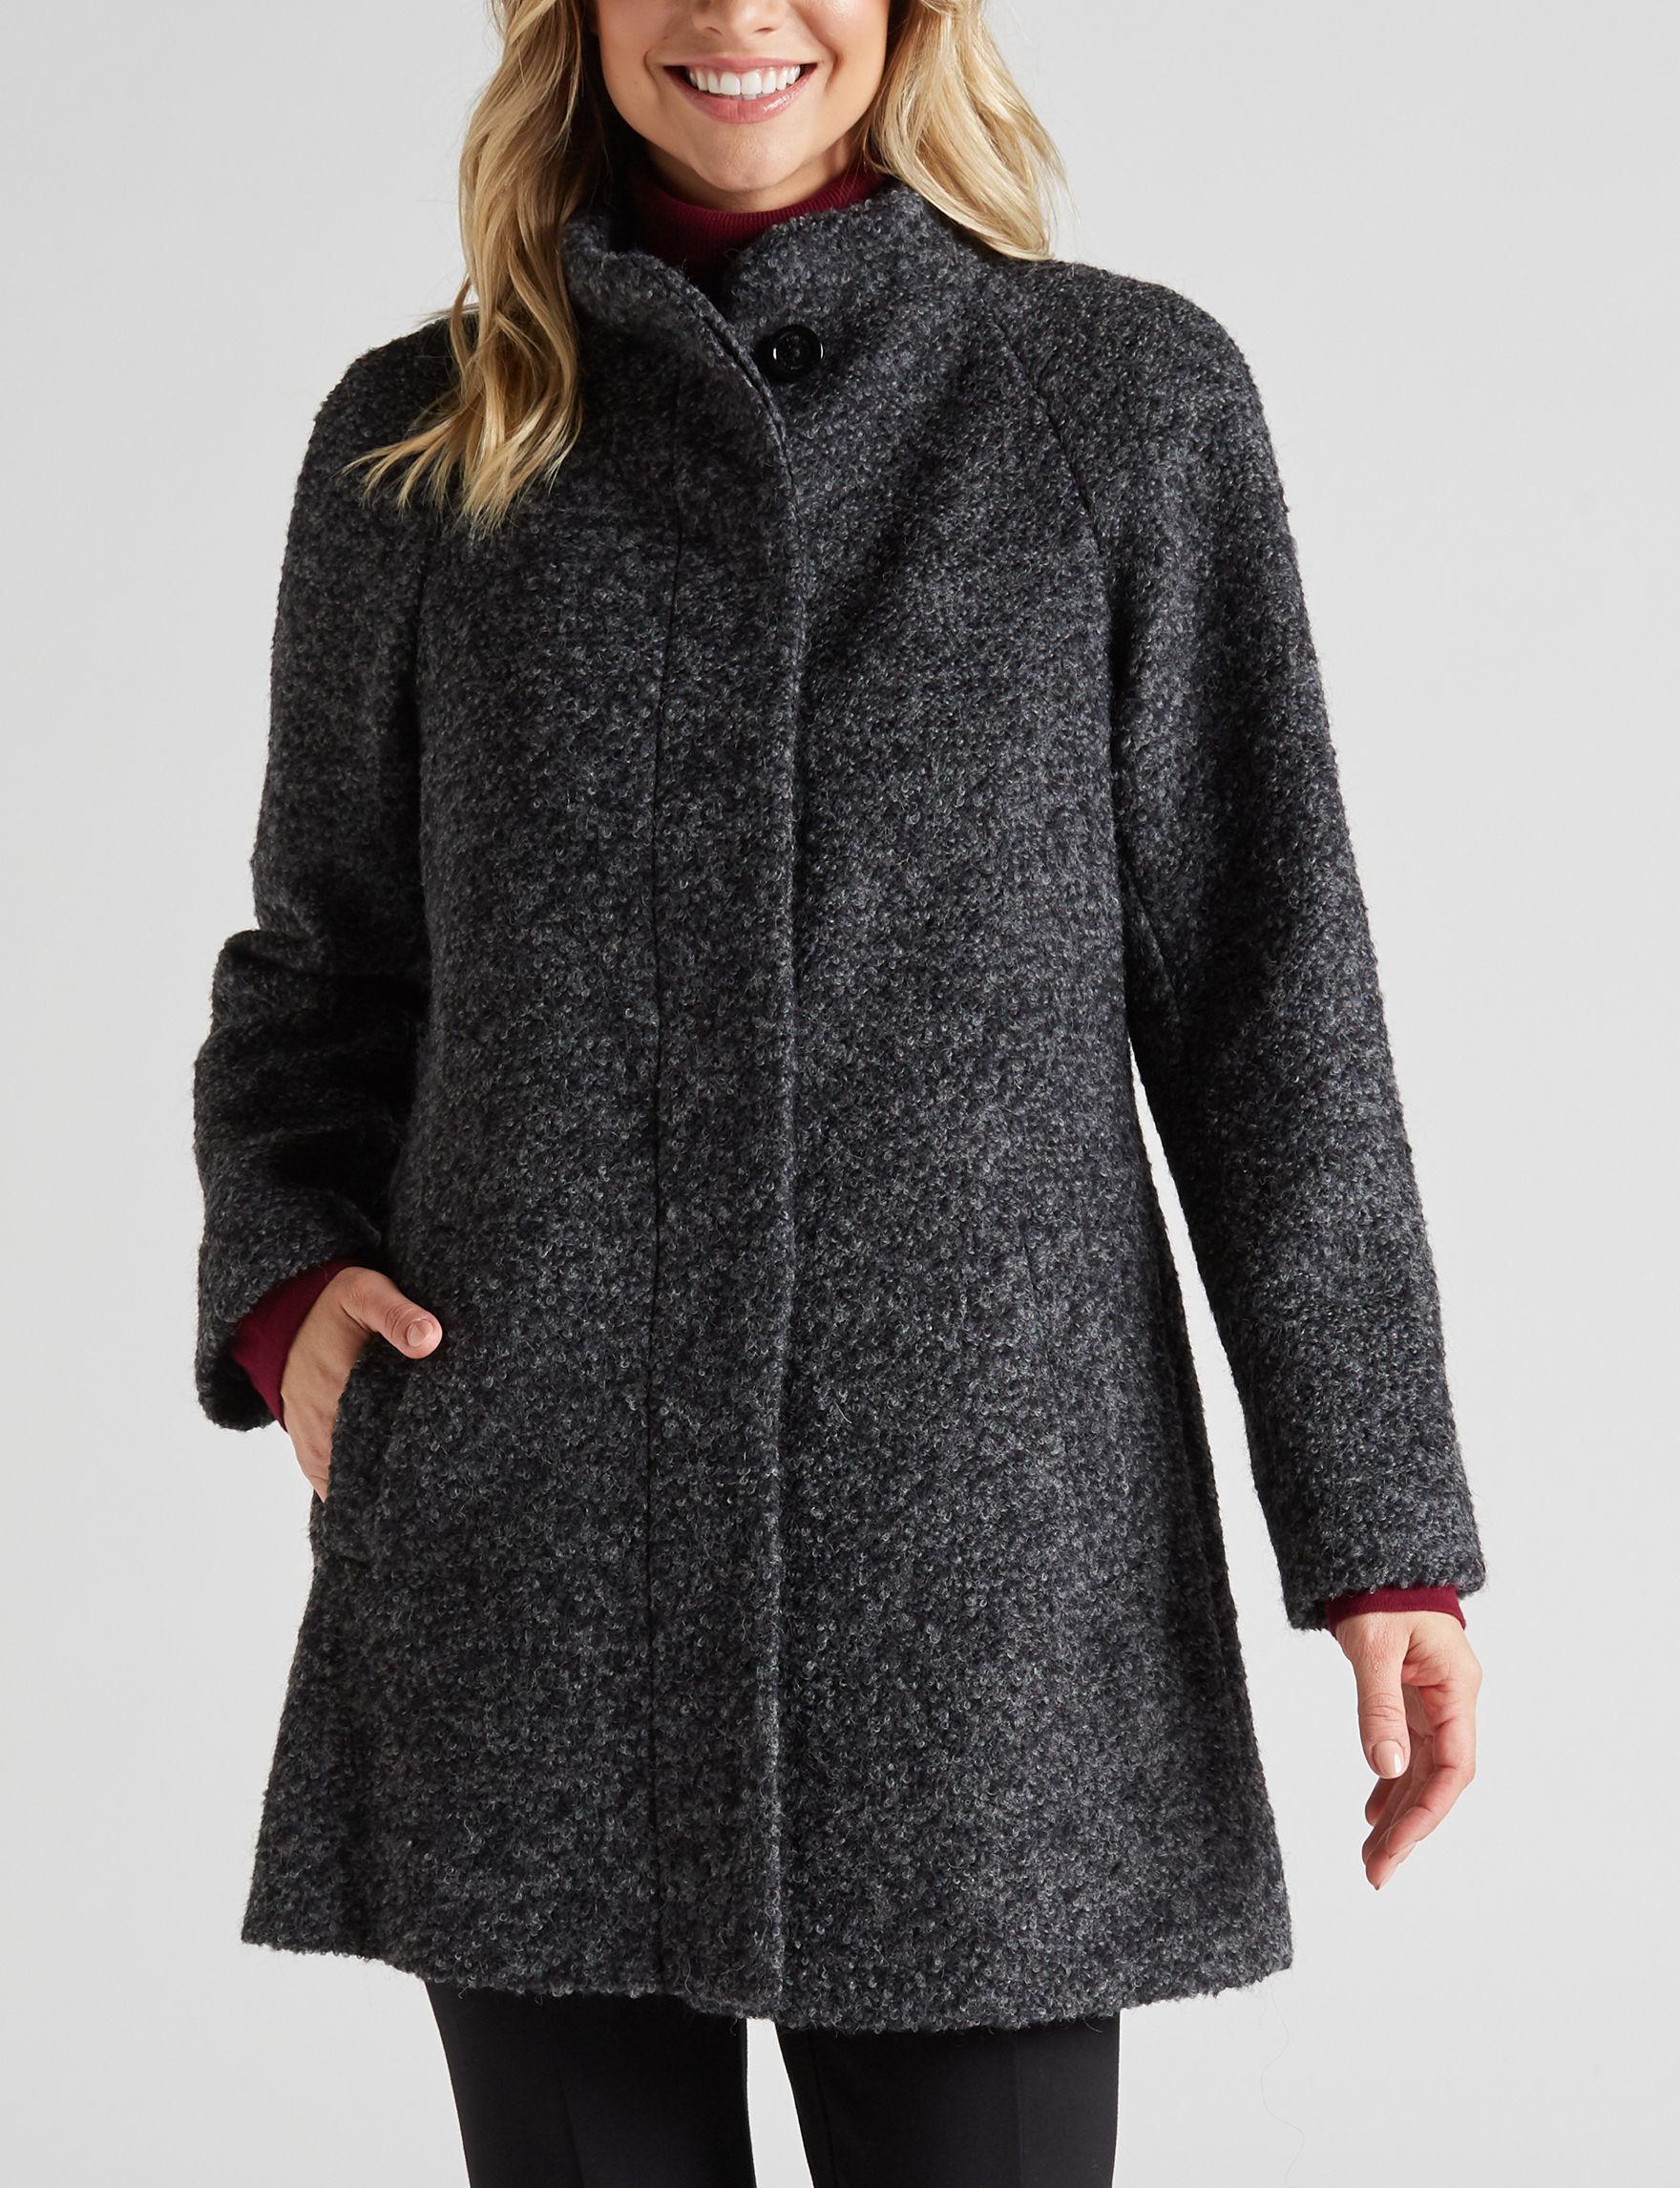 Anne Klein Charcoal Peacoats & Overcoats